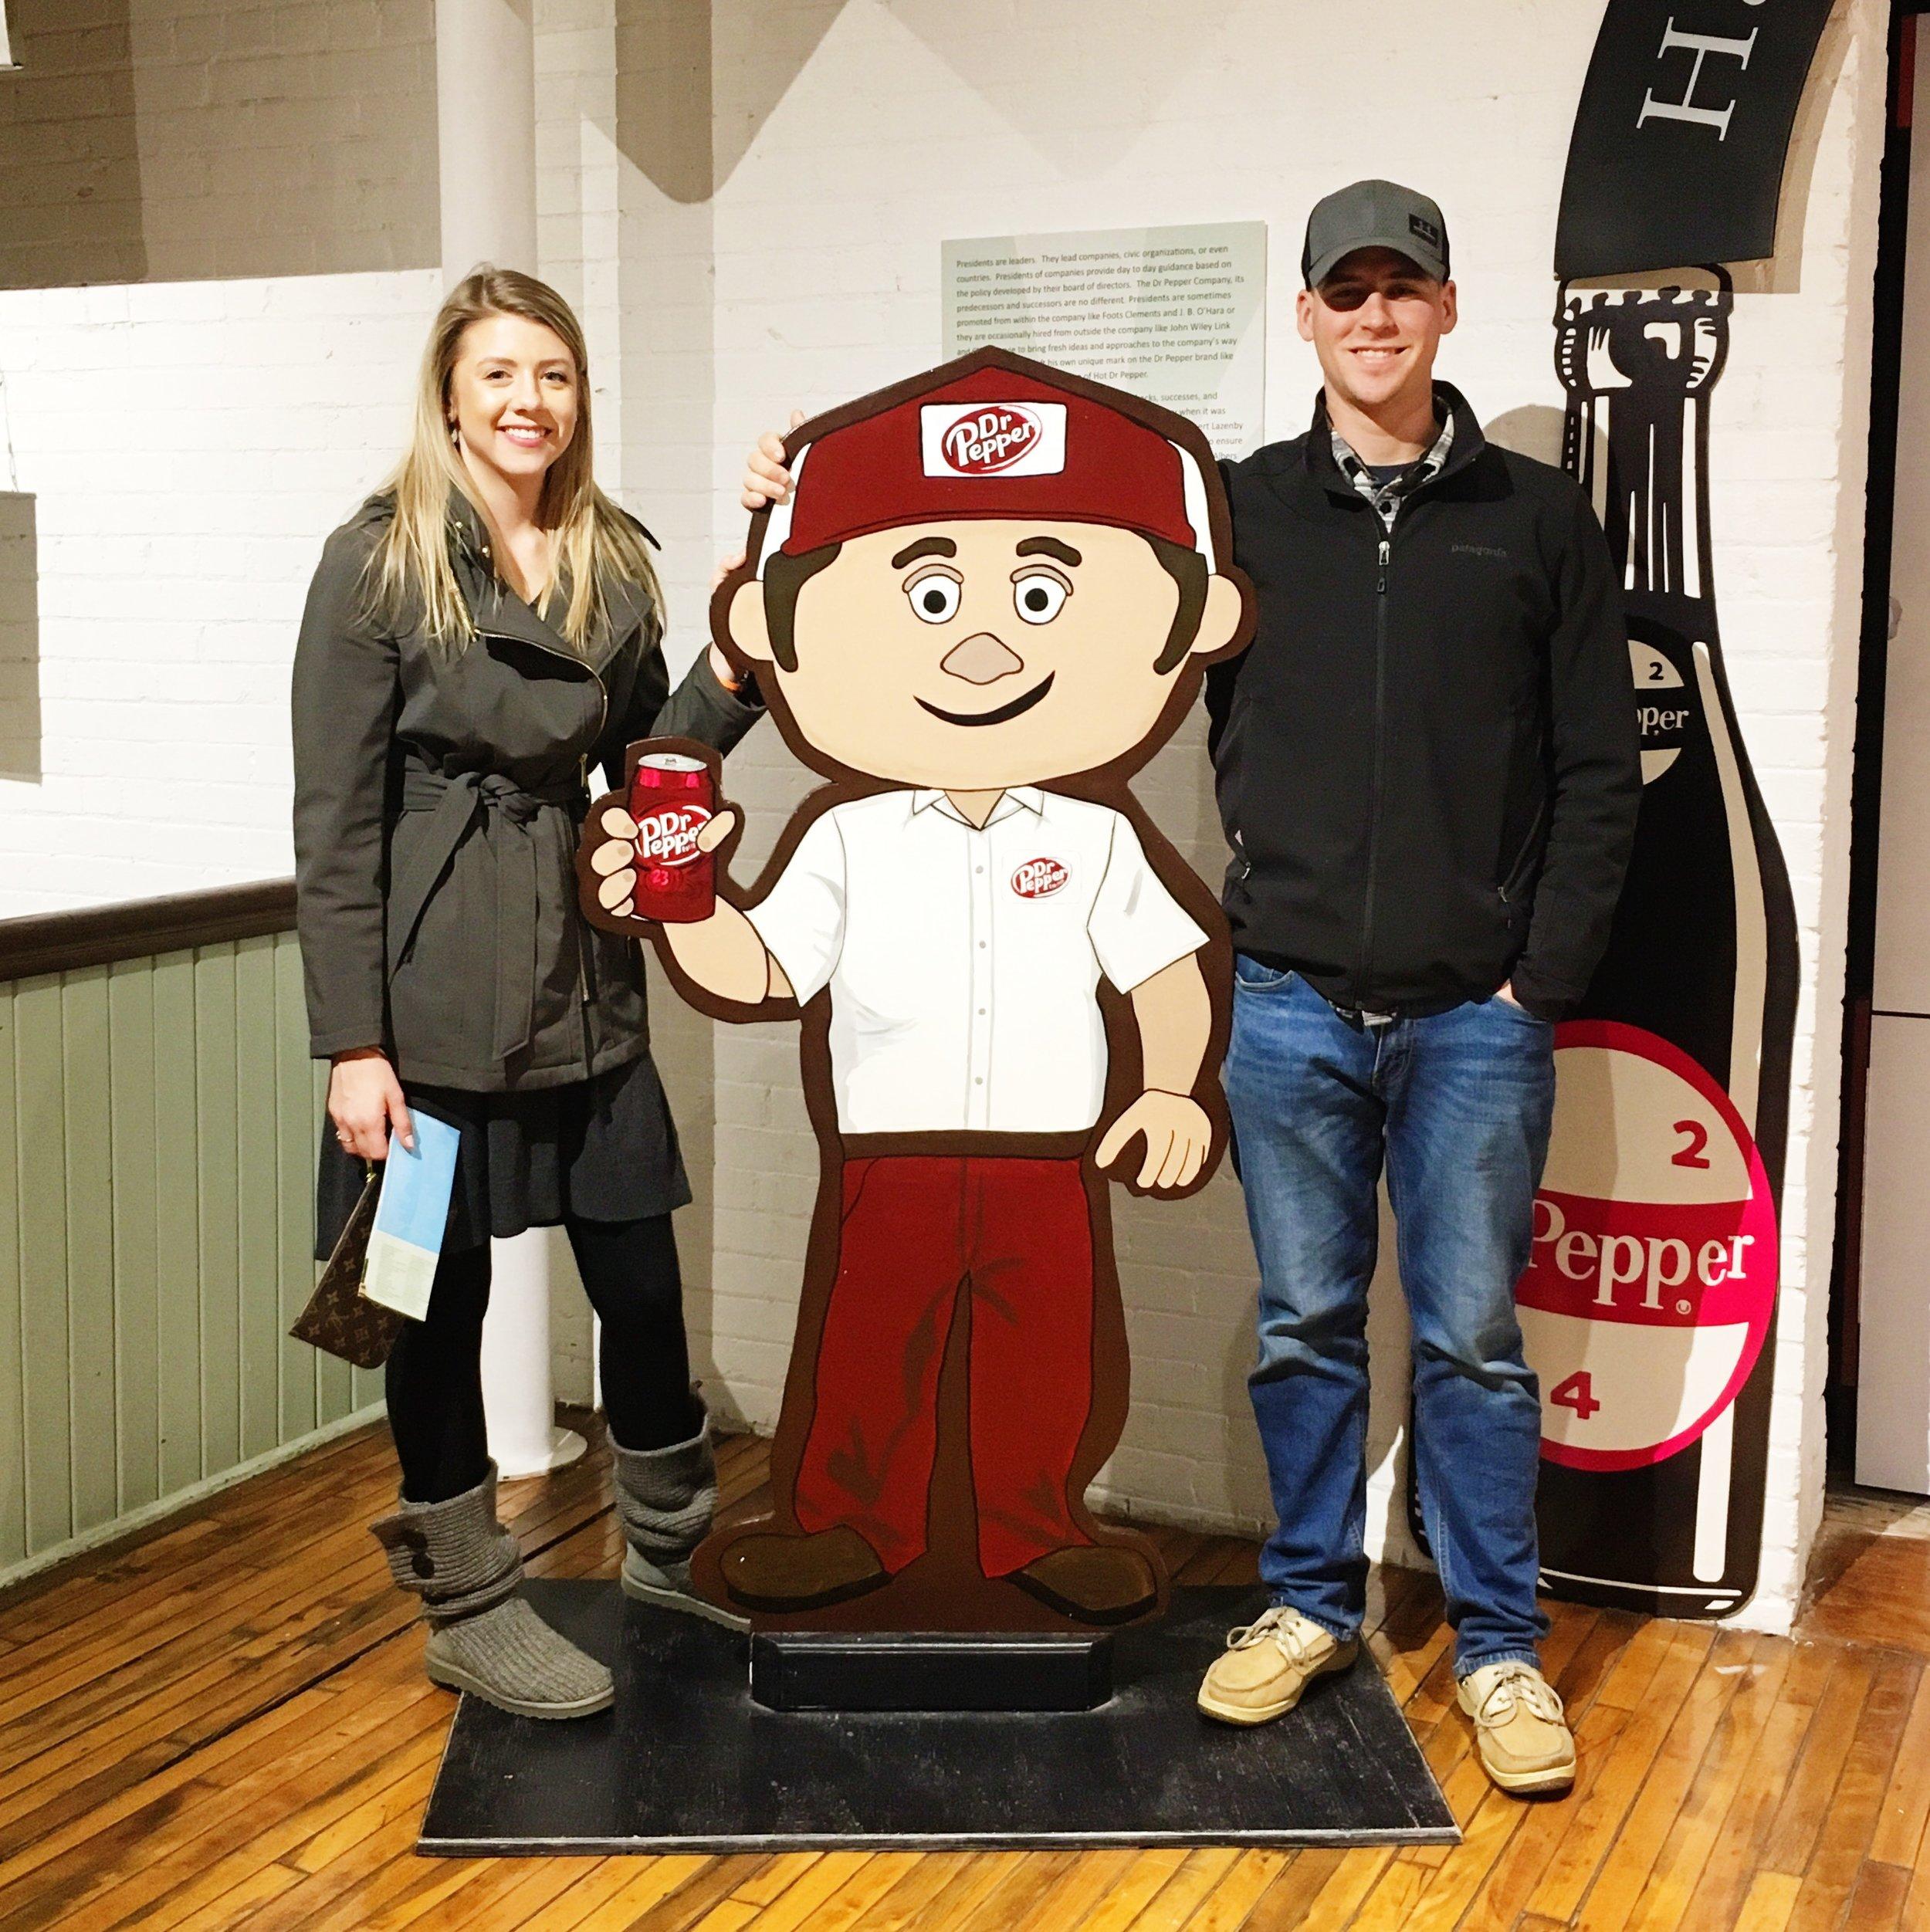 Dr Pepper Musuem - Things to do in Waco, Texas - Wander Dust Blog  (1).JPG